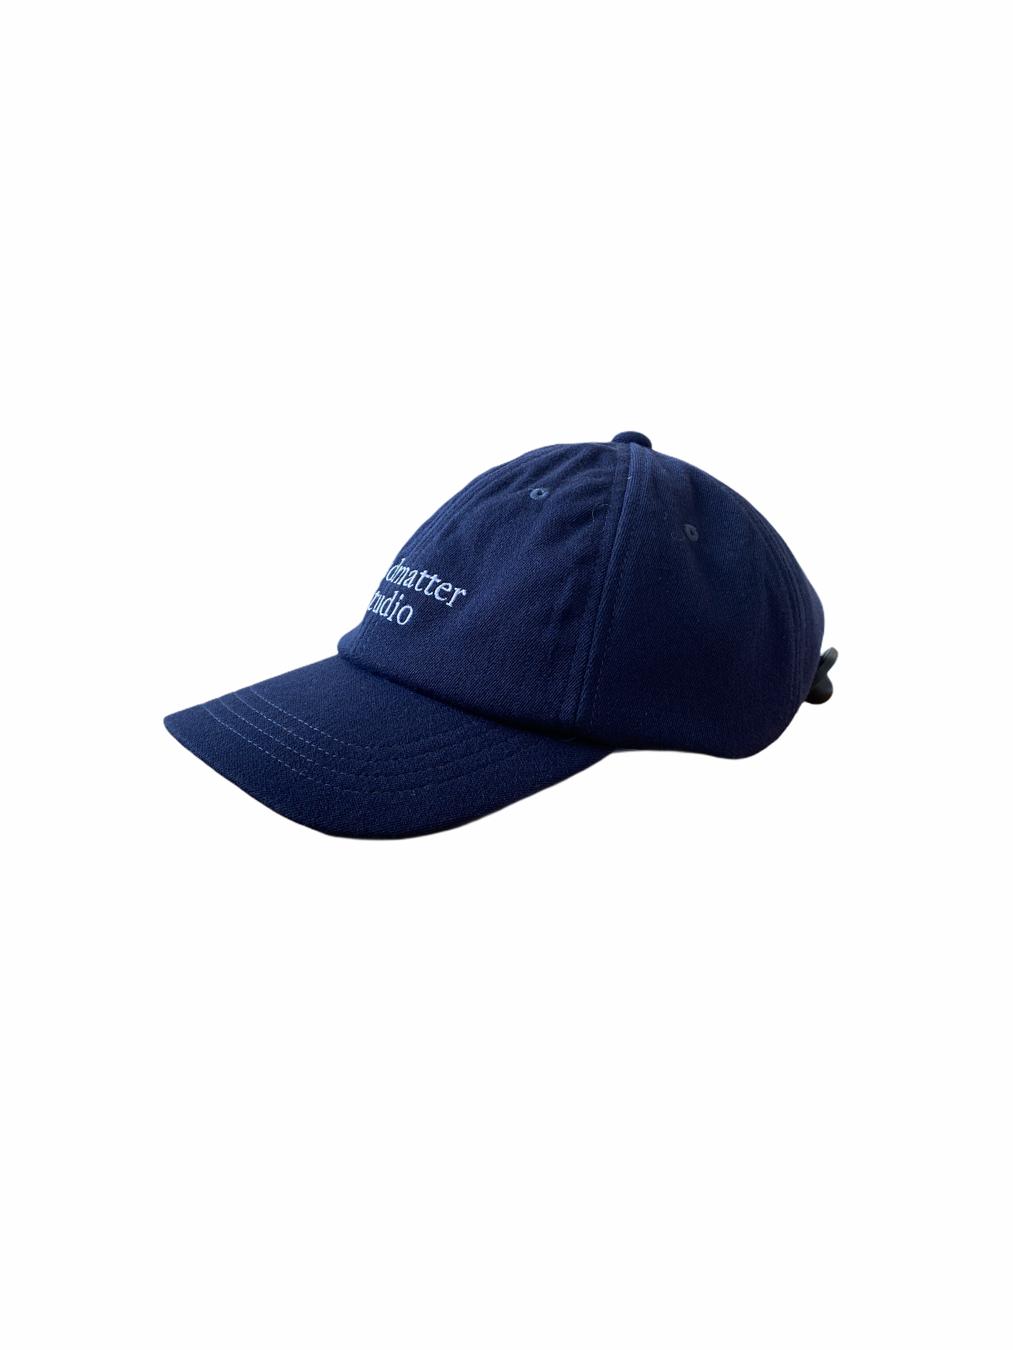 Six Nature Cap  (Dark Navy)